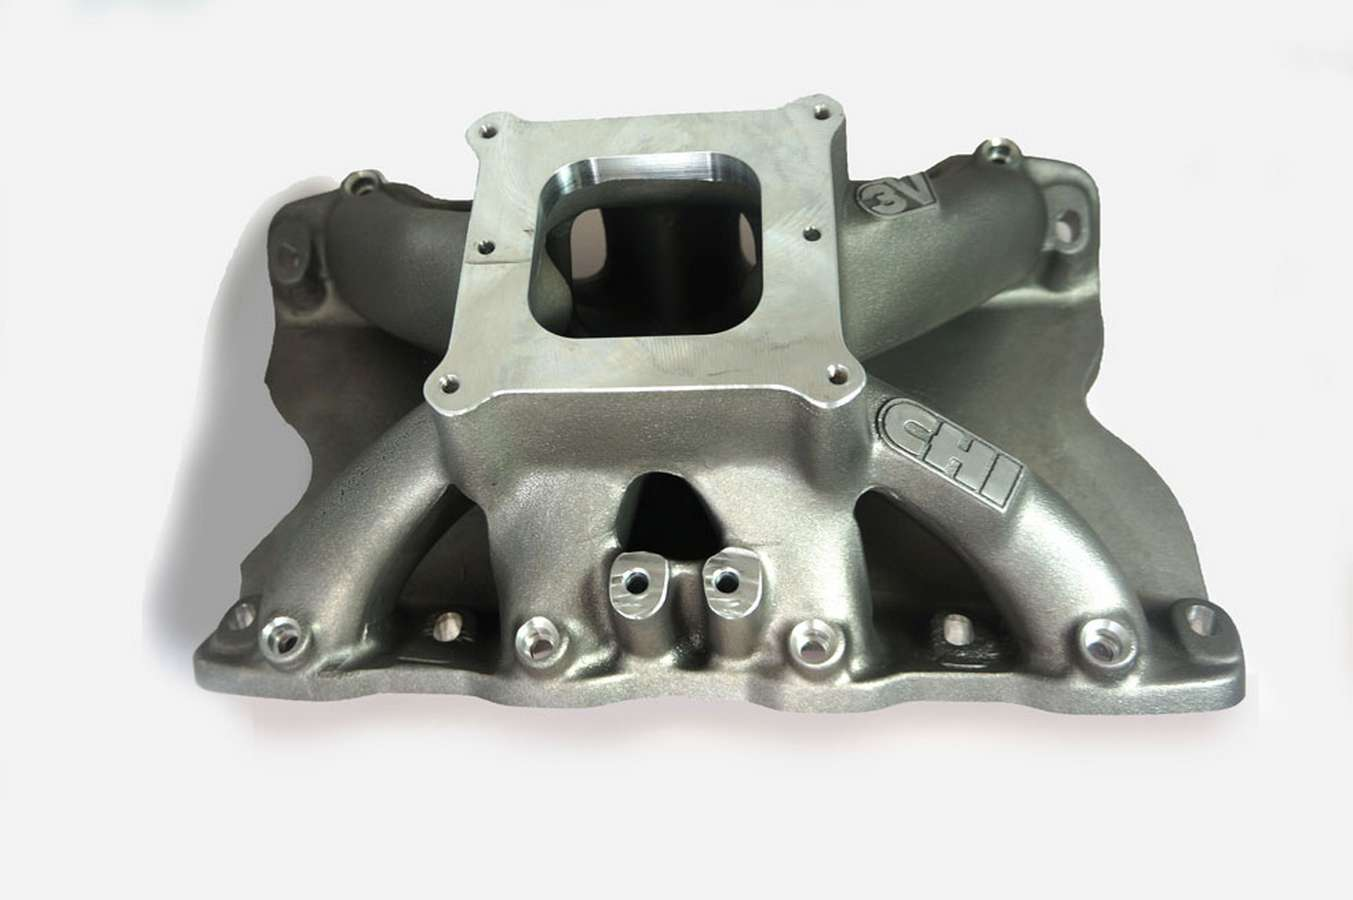 Intake Manifold - 3V 185cc Cleveland 9.2